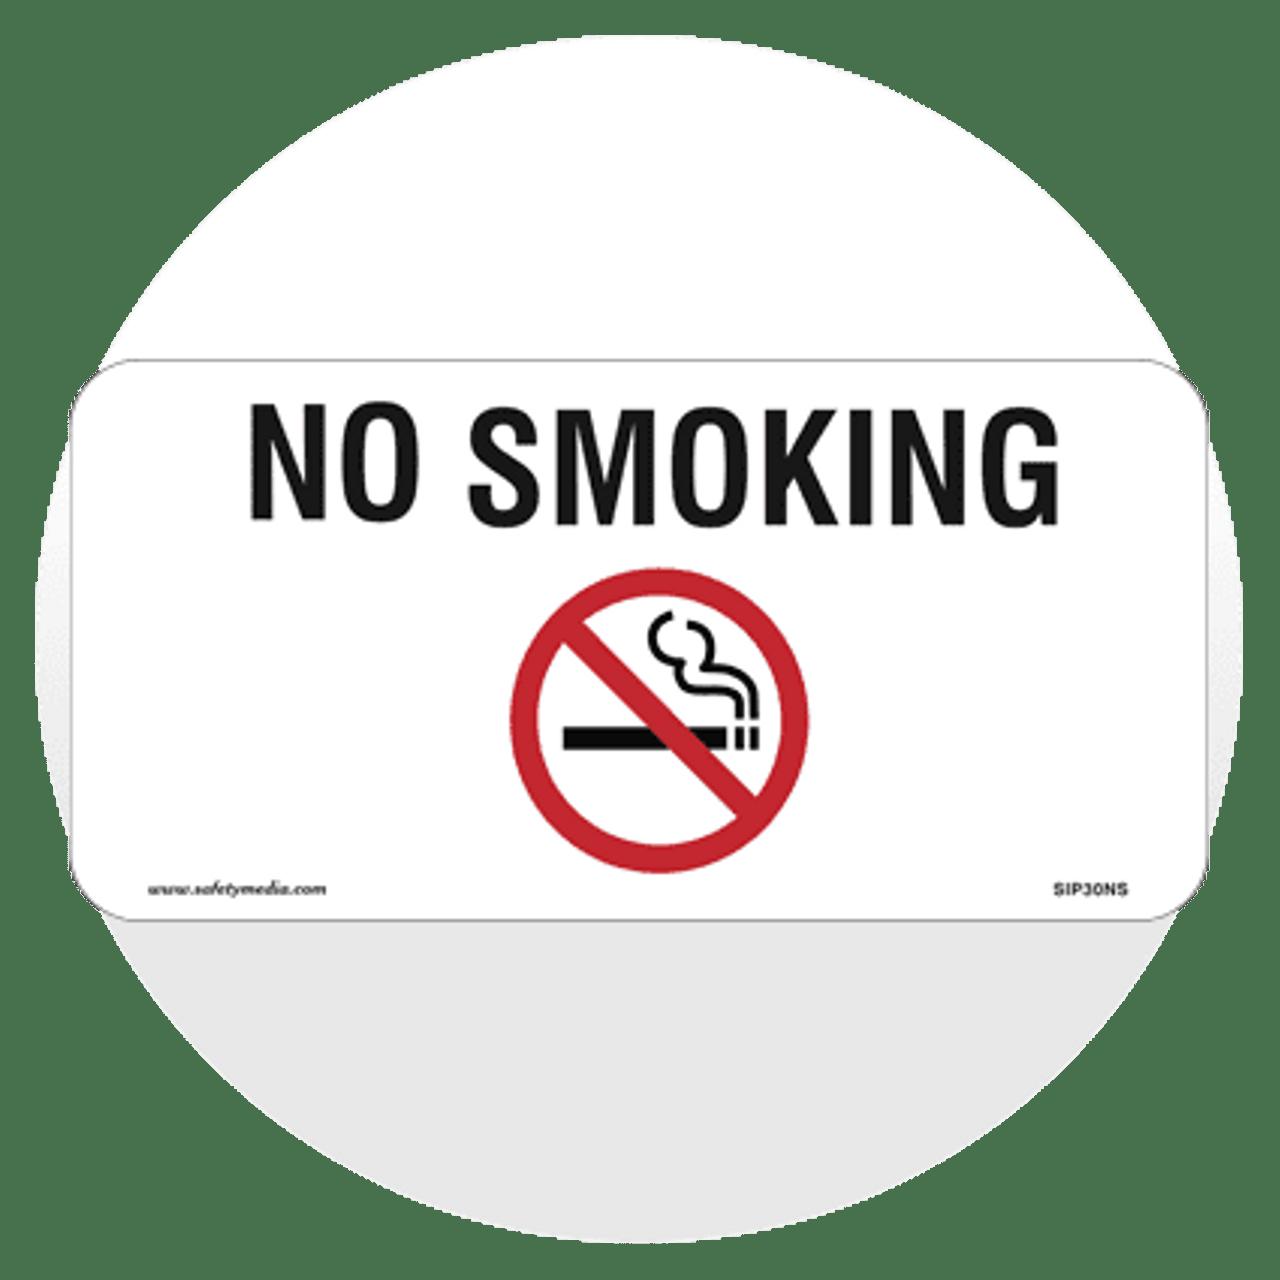 Generic No Smoking Signs